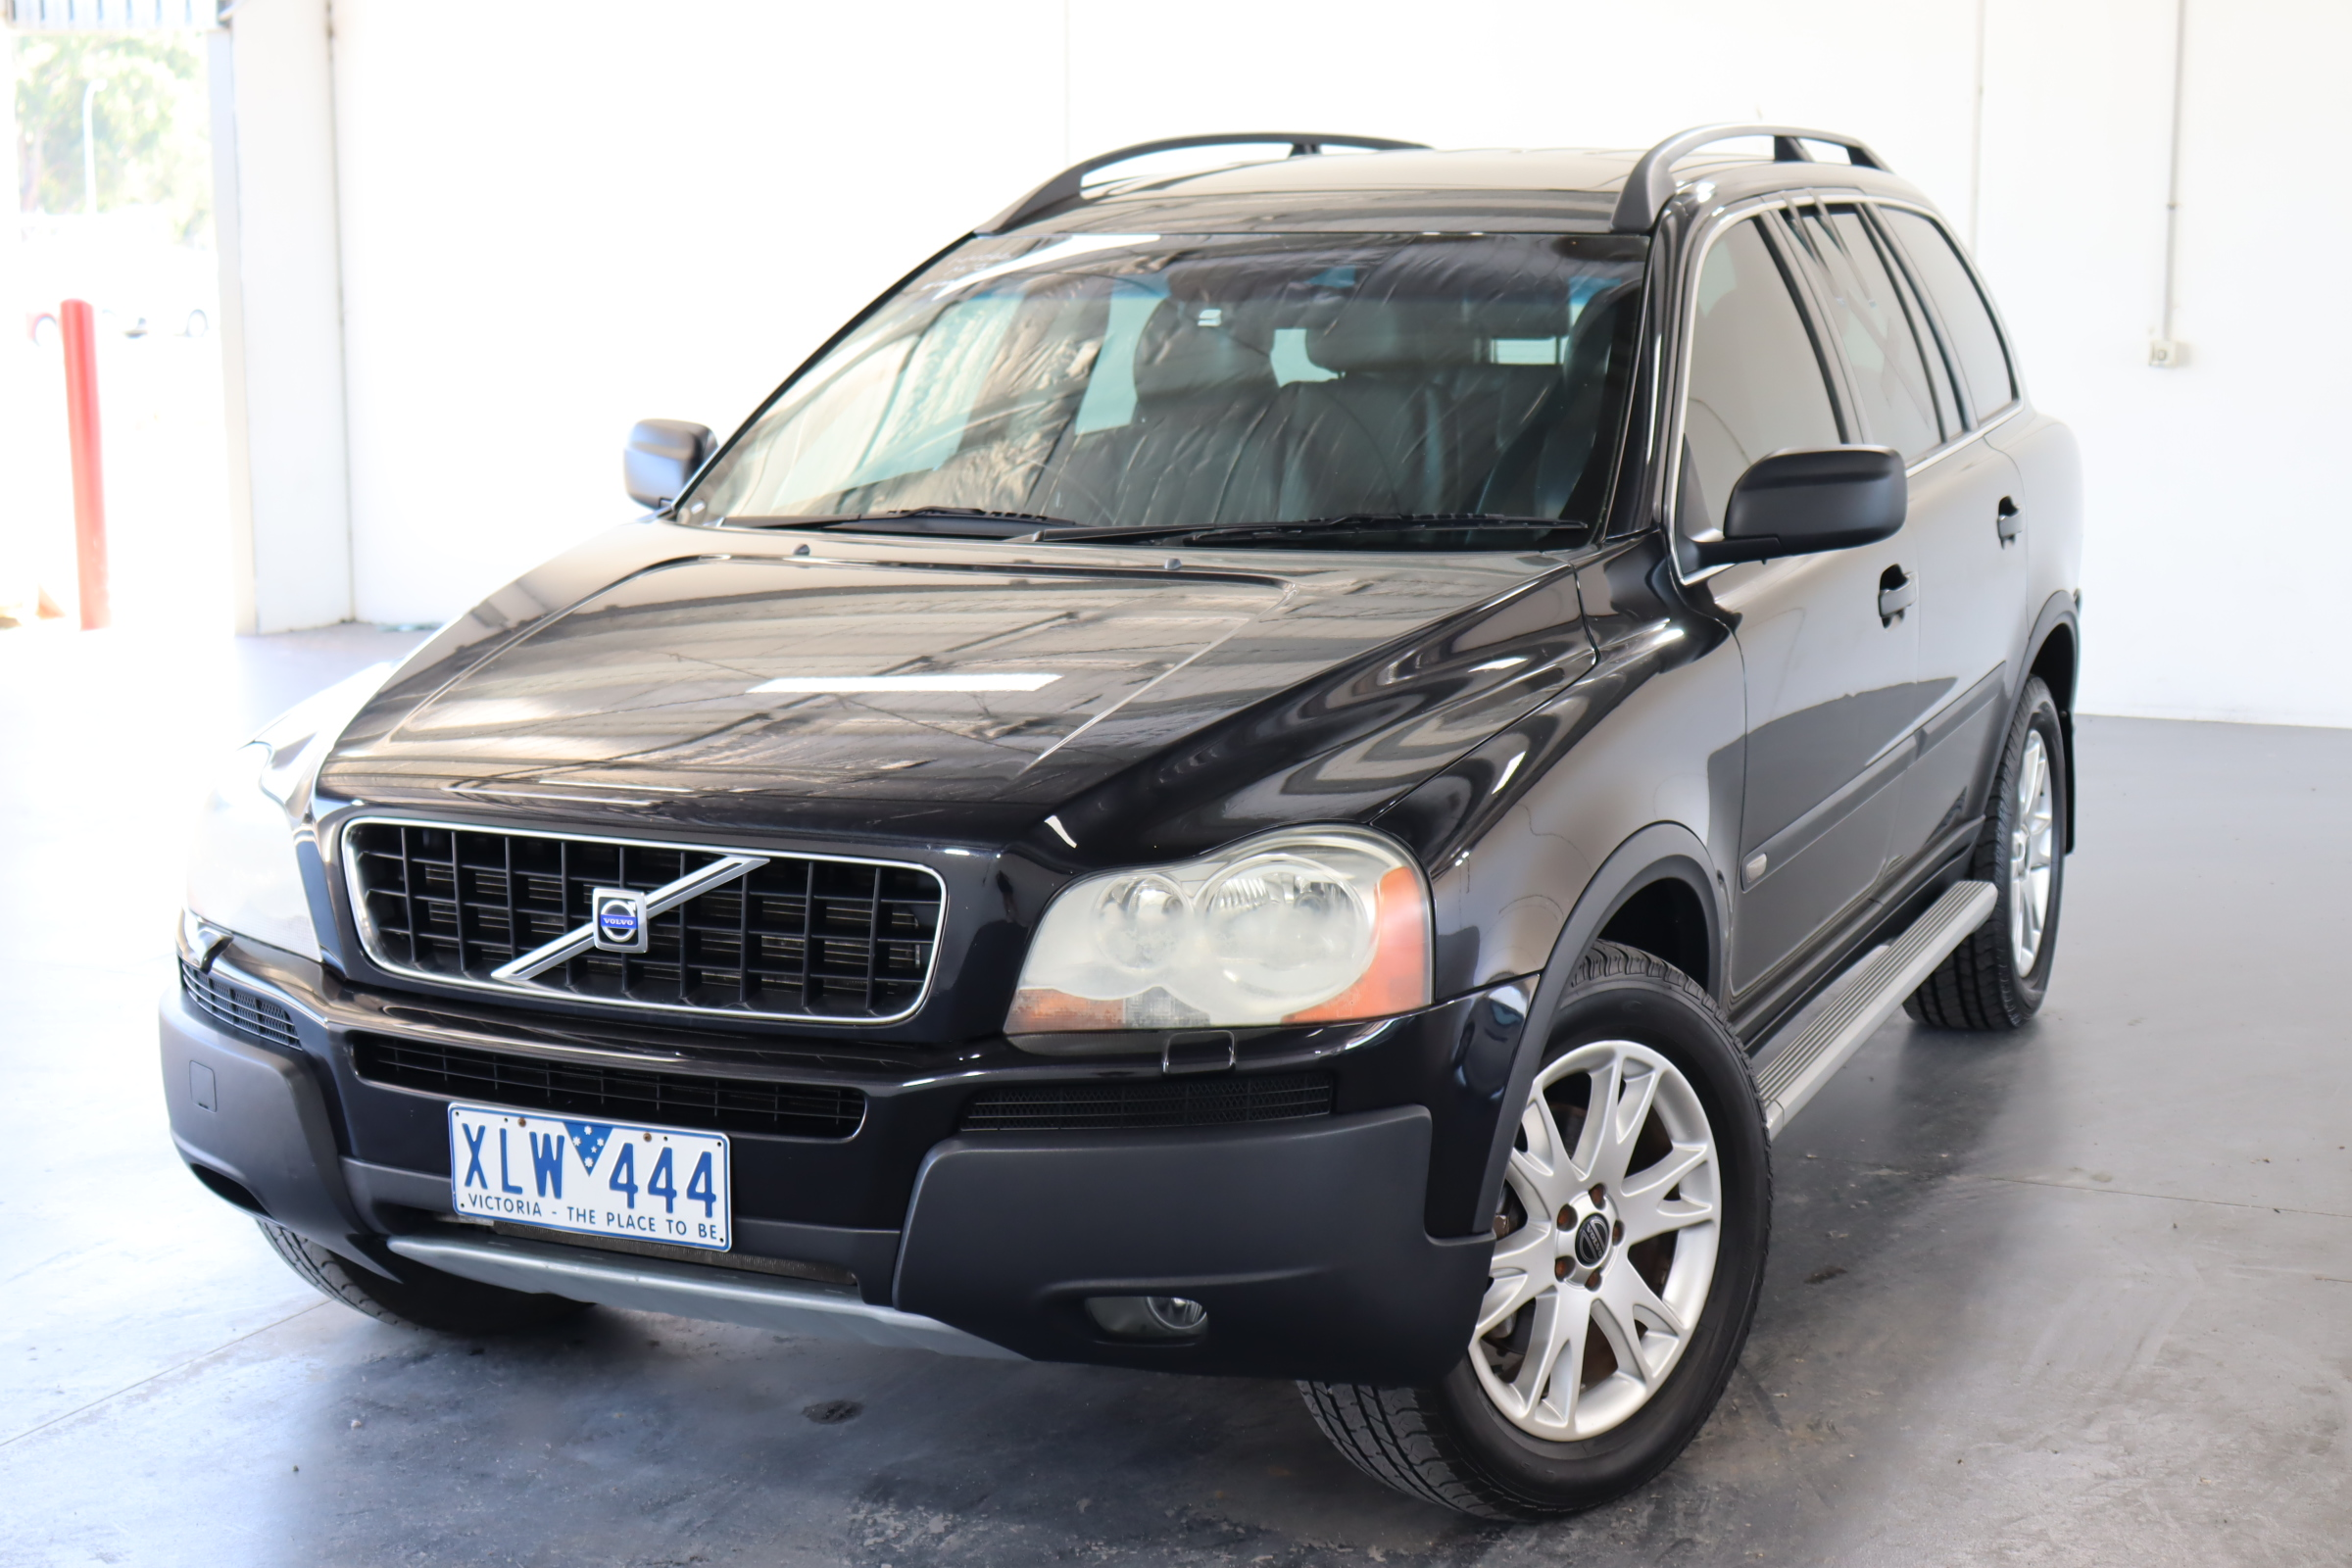 2003 Volvo XC90 T6 Automatic 7 Seats Wagon